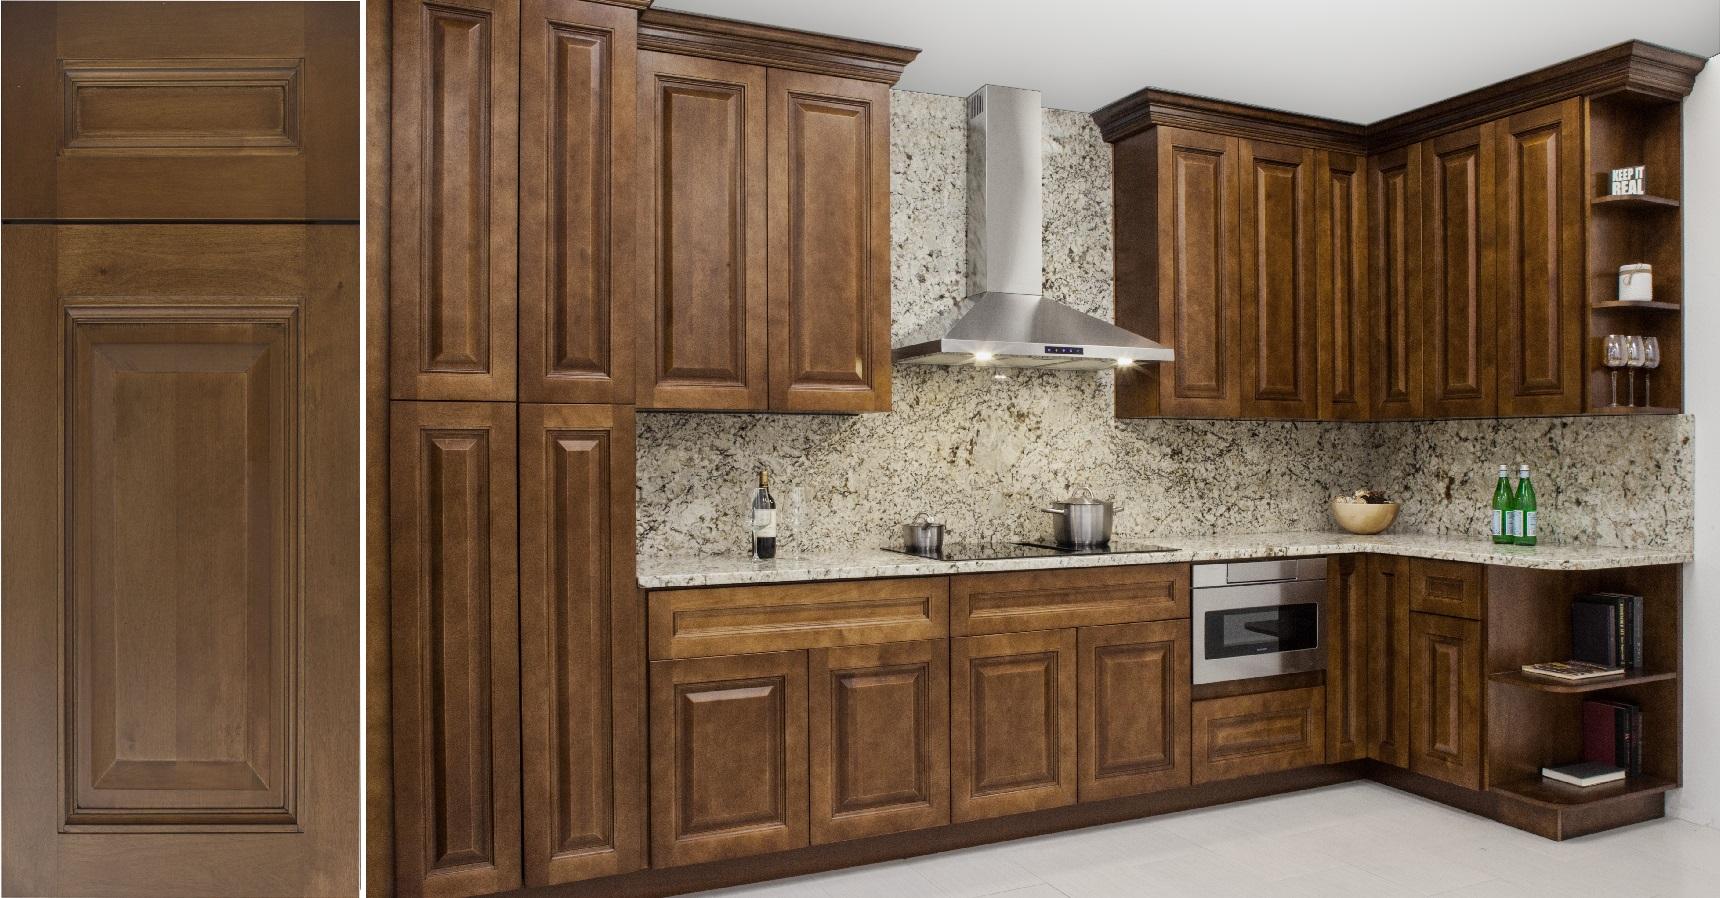 Maduro Frameless Cabinets - New Generation Kitchen & Bath